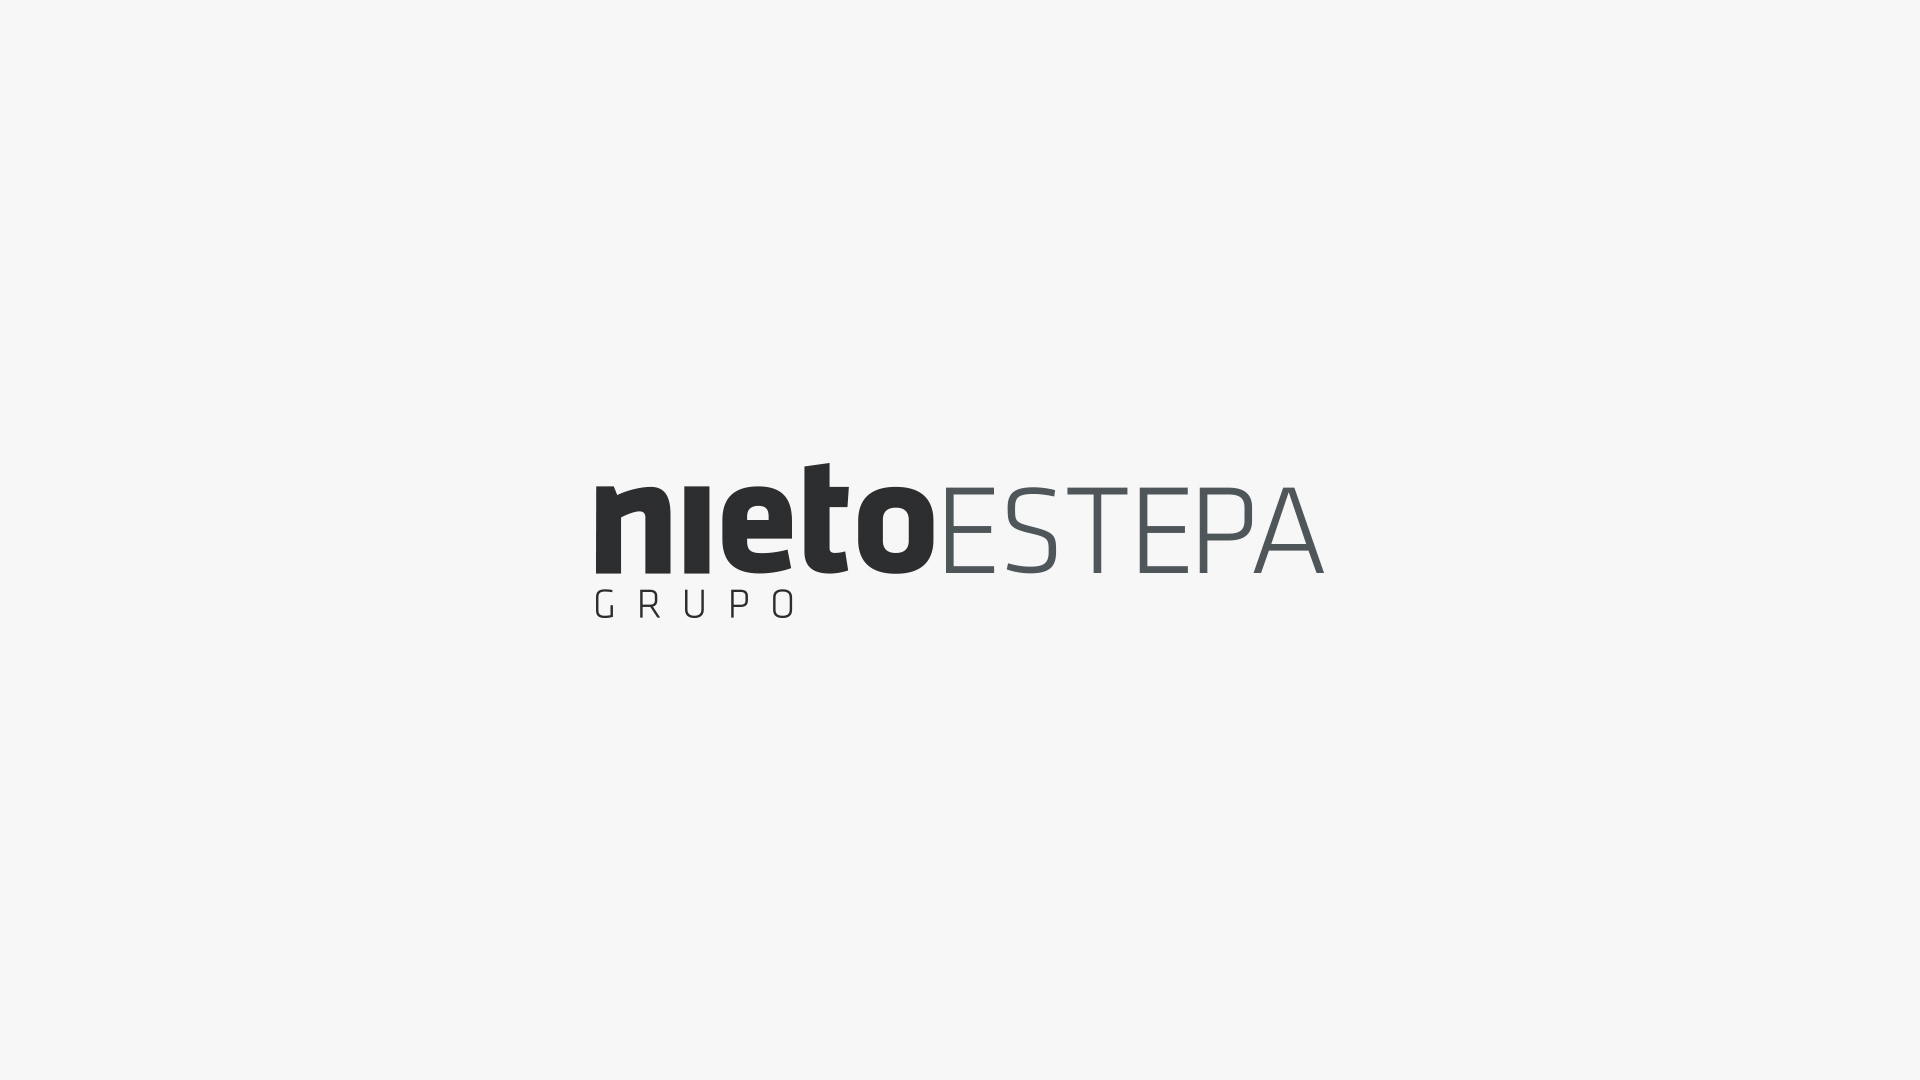 Grupo Nieto Estepa